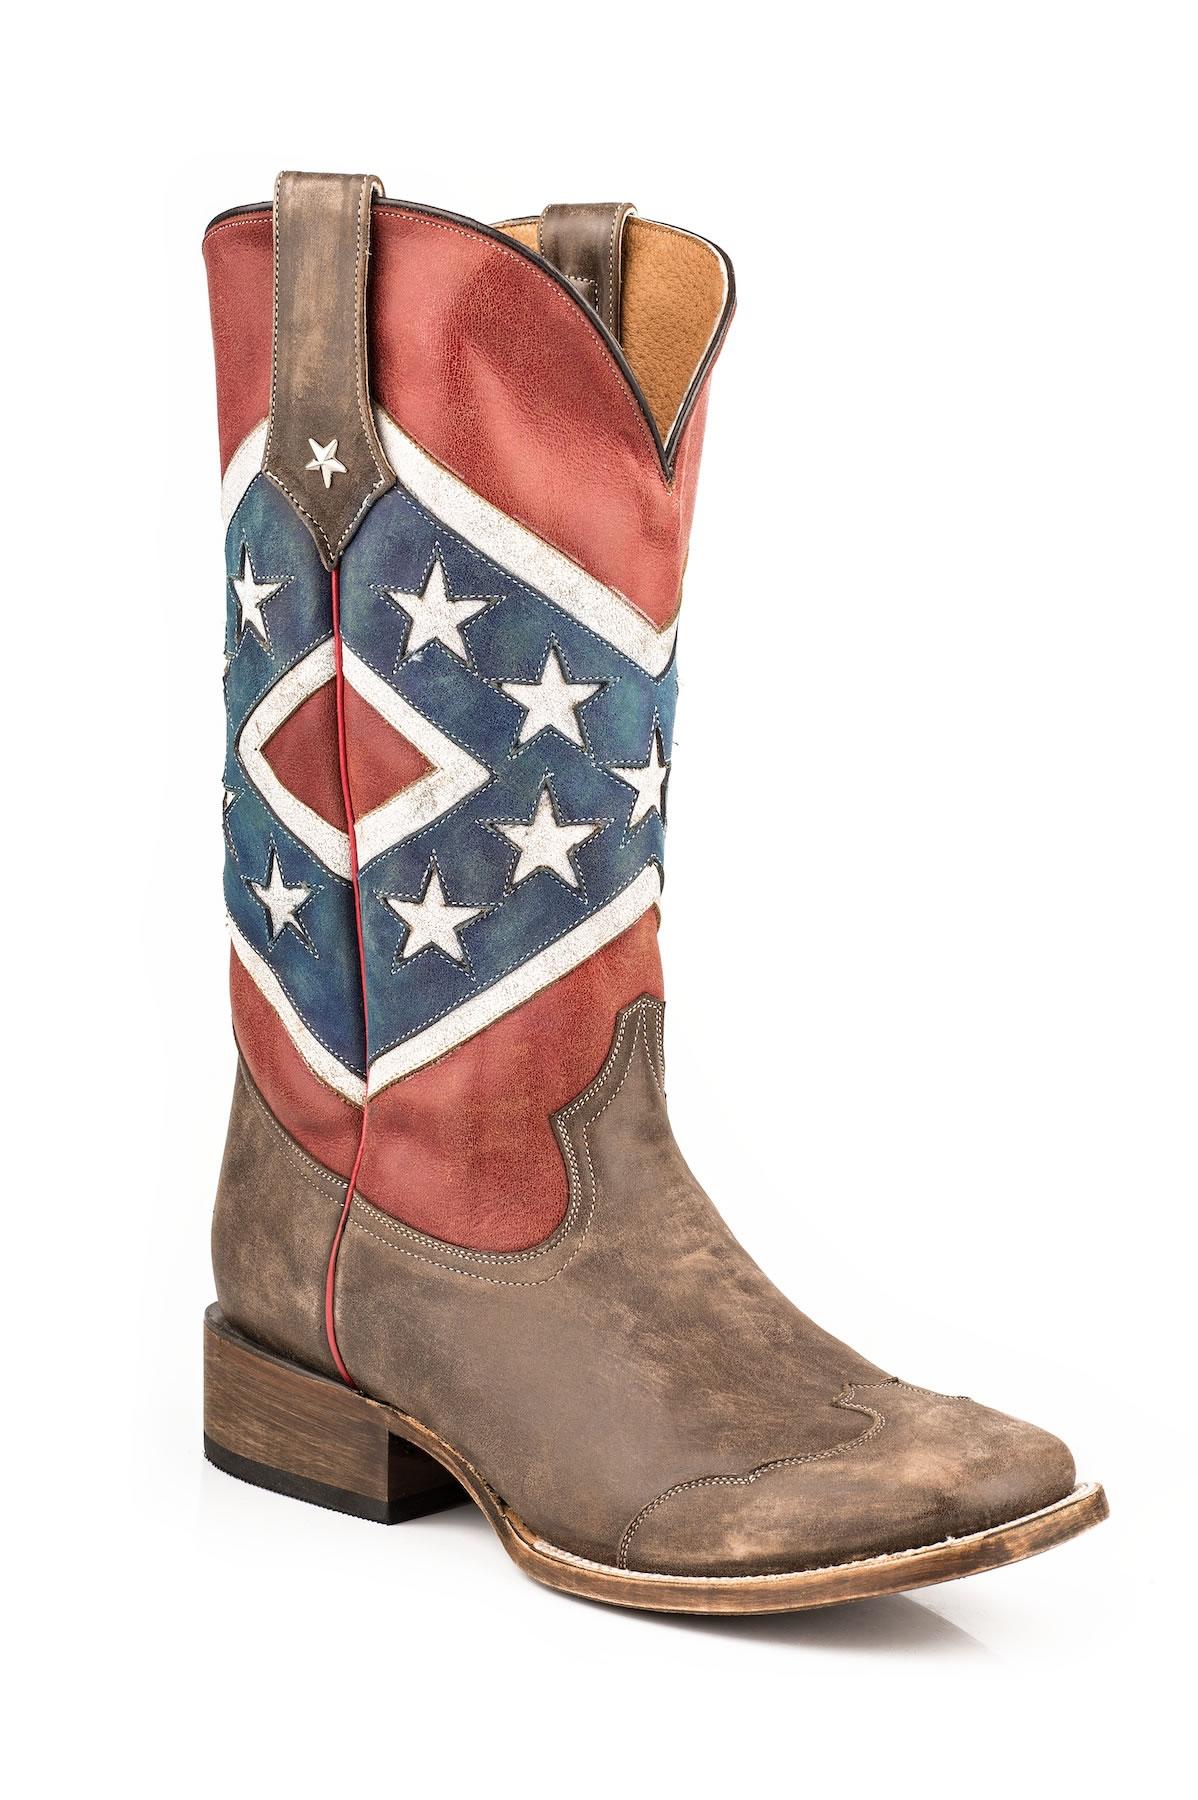 6e9da9d397c Roper Mens Distressed Rebel Flag Square Toe Boots